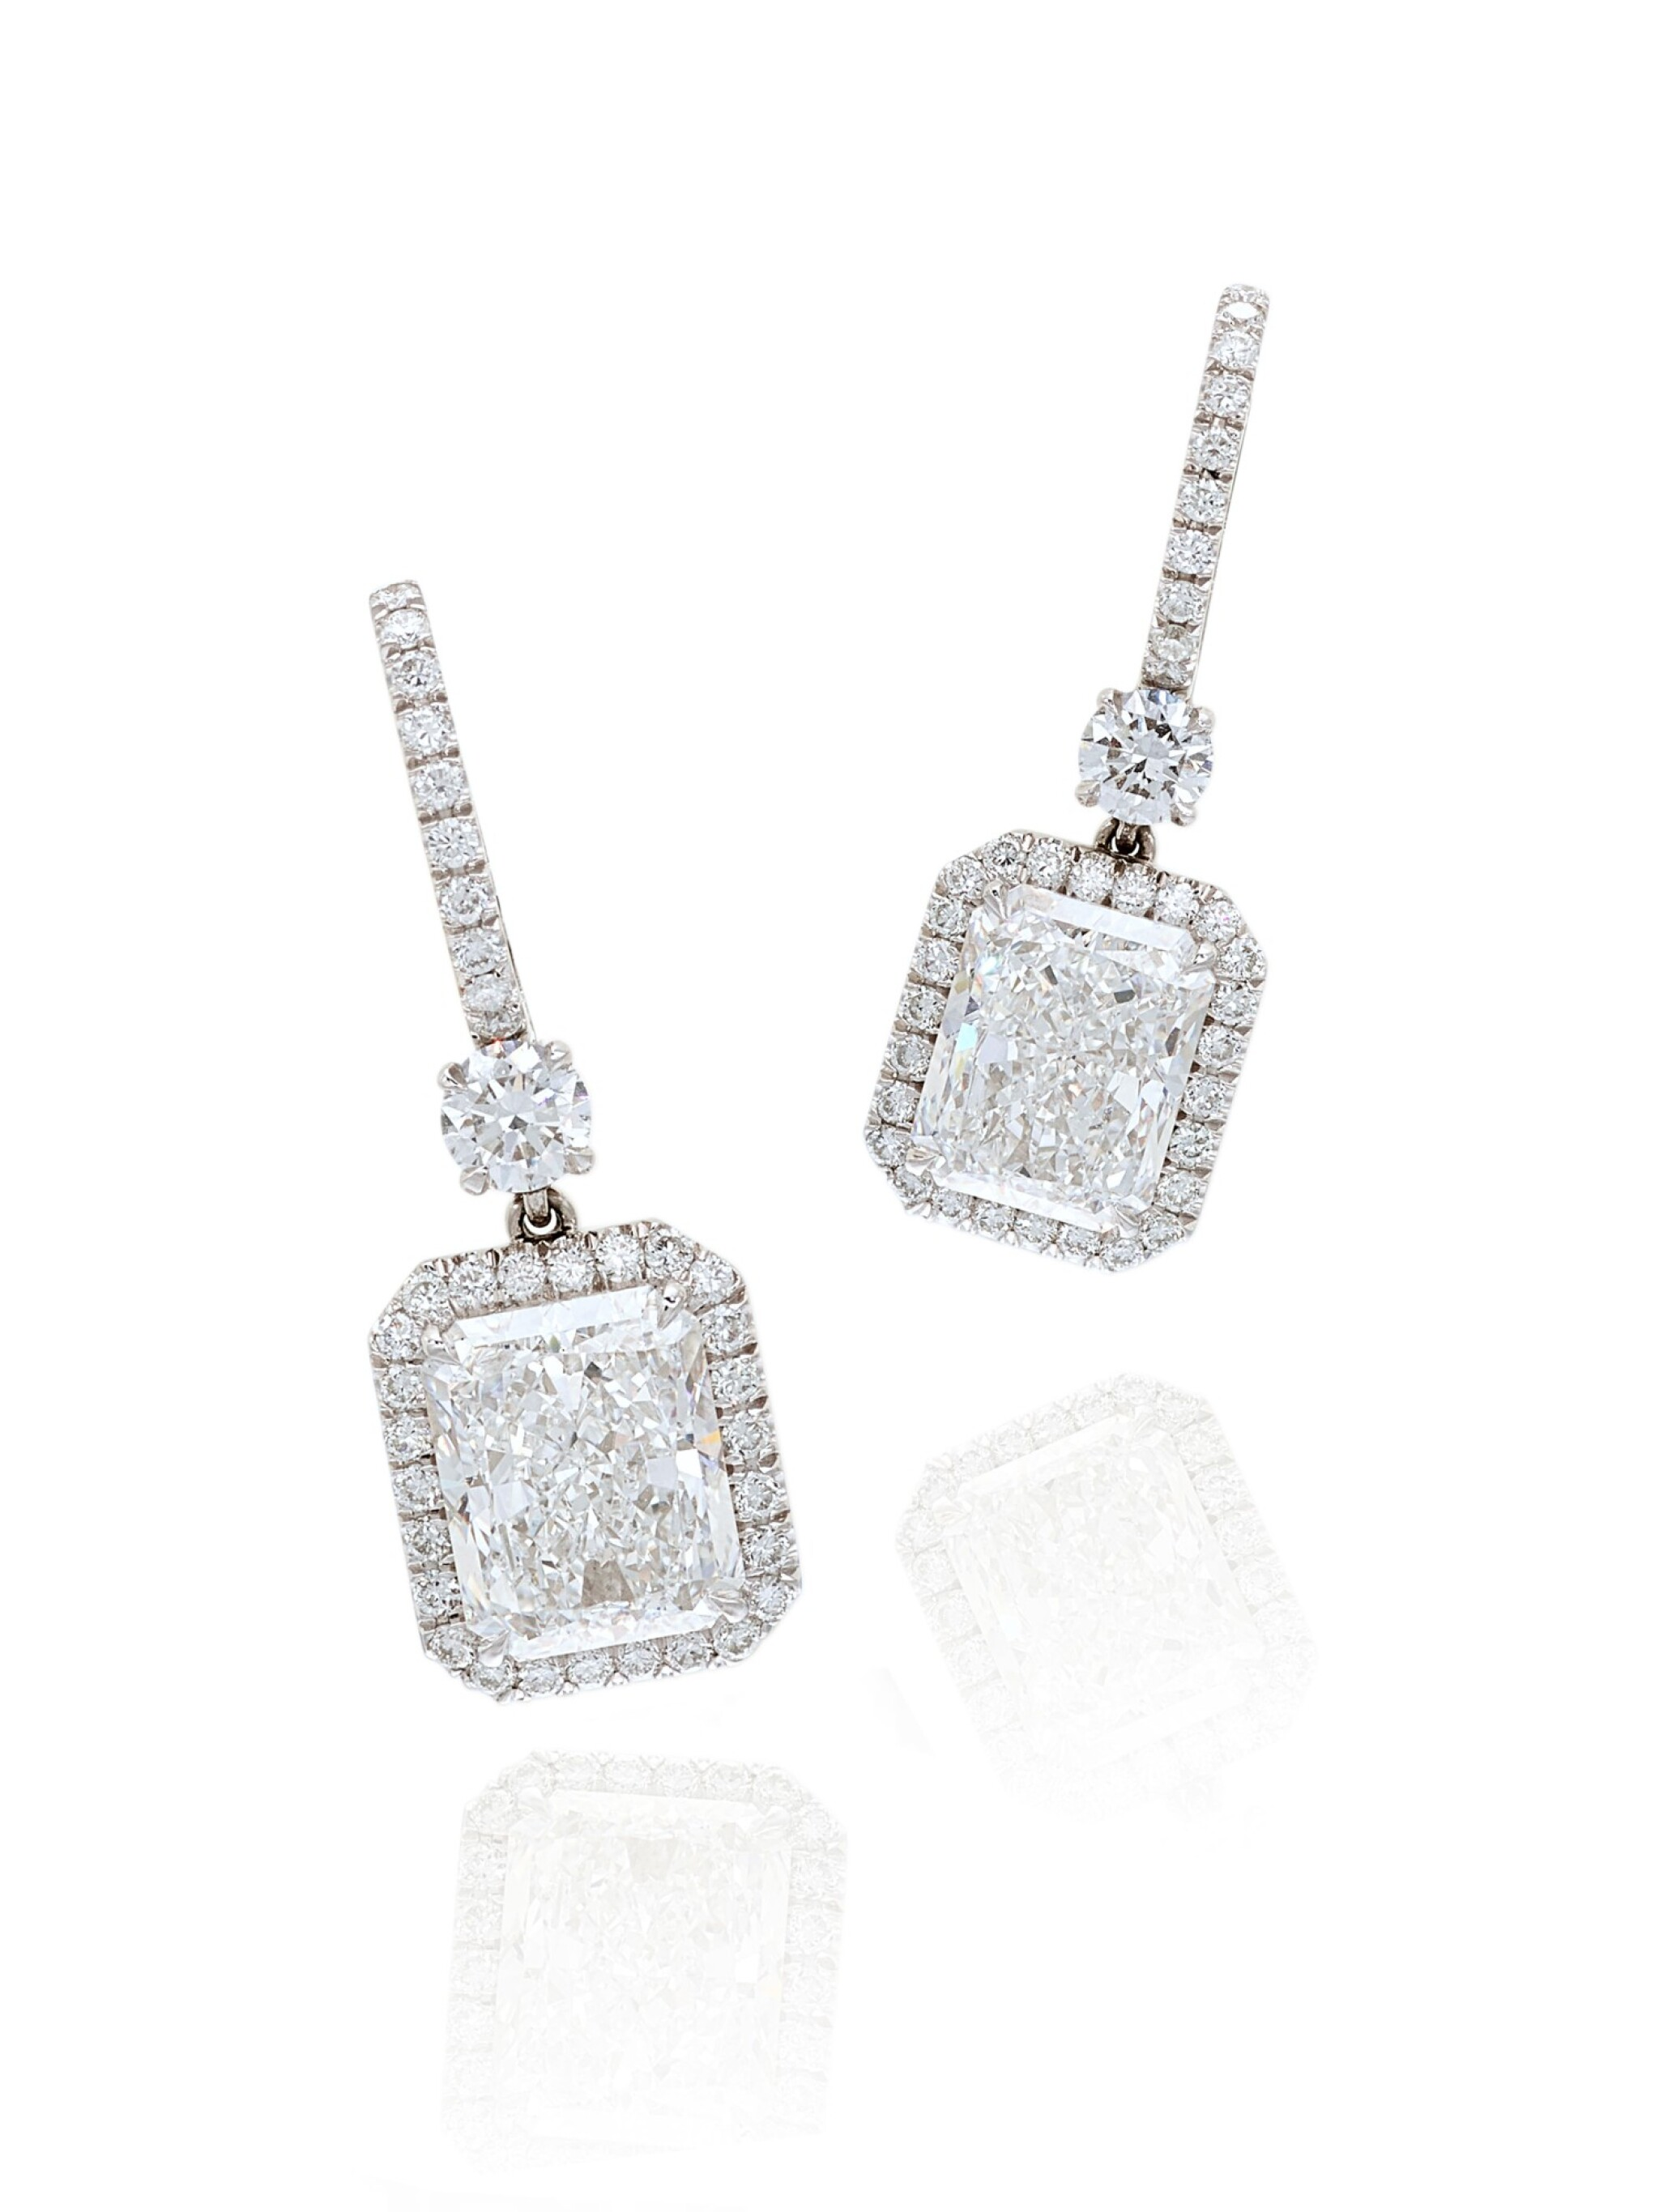 View full screen - View 1 of Lot 1652. Pair of Diamond Pendent Earrings   3.02及3.02克拉 方形 D色 鑽石 耳墜一對.